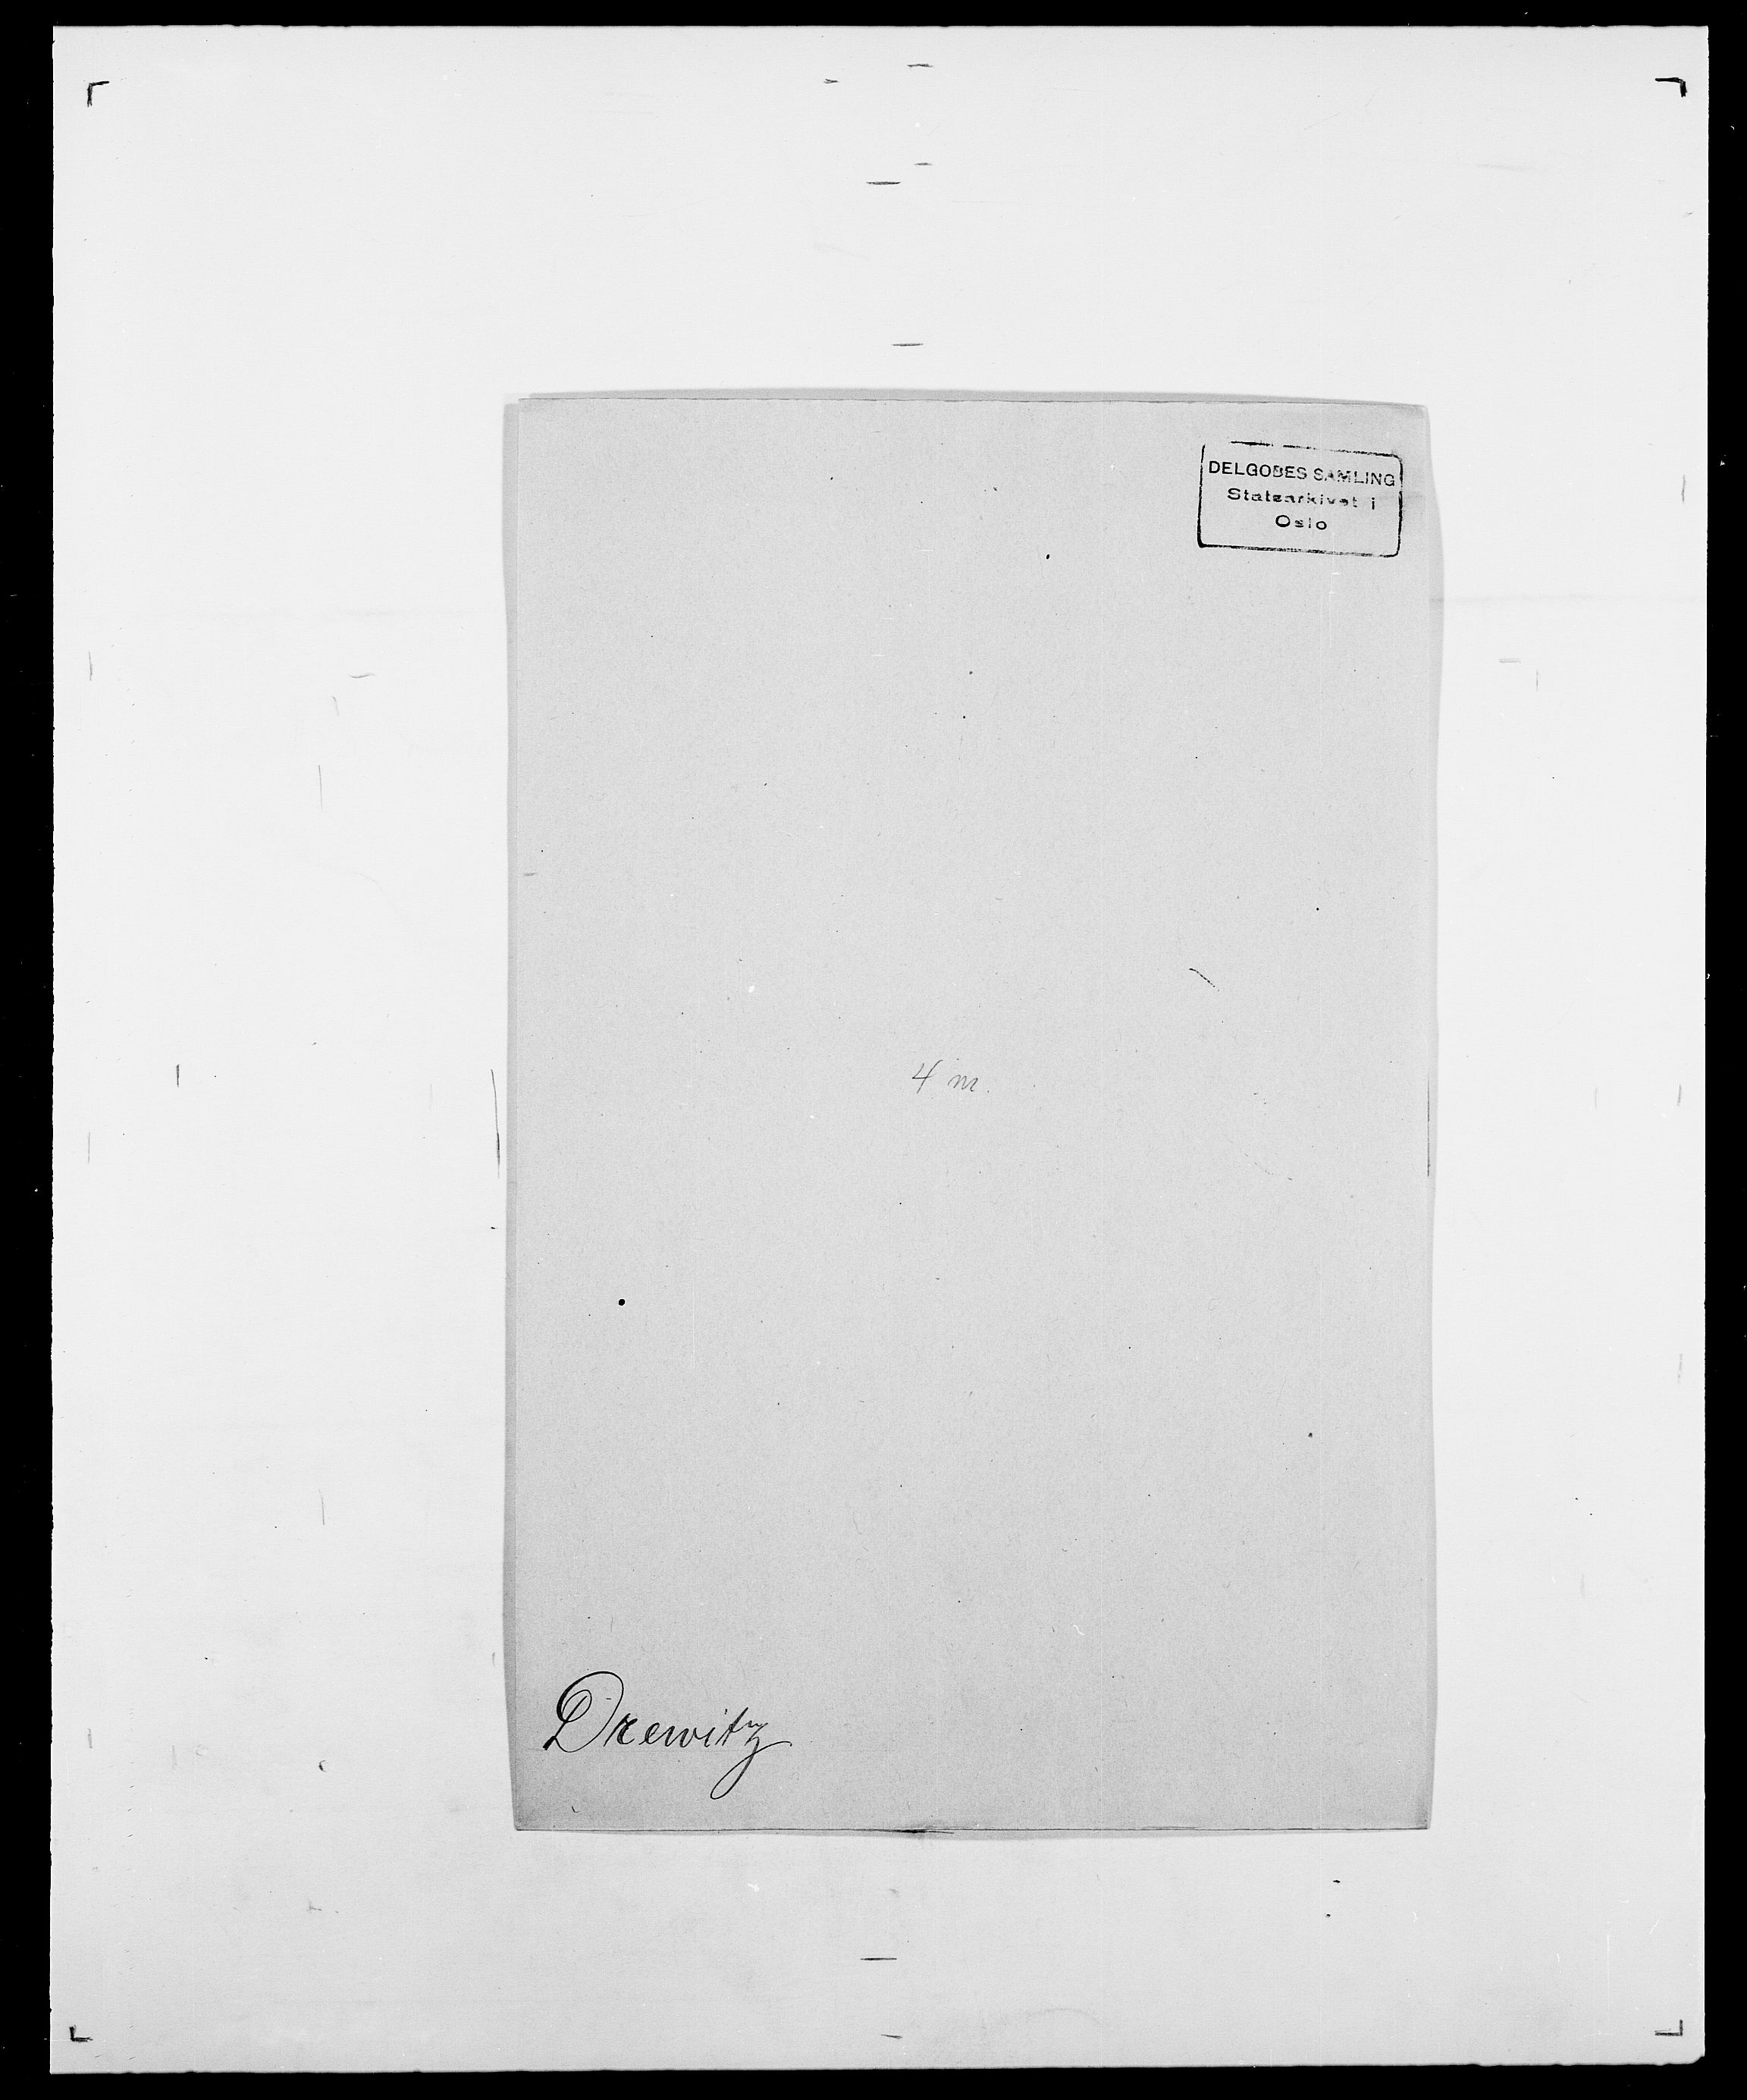 SAO, Delgobe, Charles Antoine - samling, D/Da/L0009: Dahl - v. Düren, s. 776